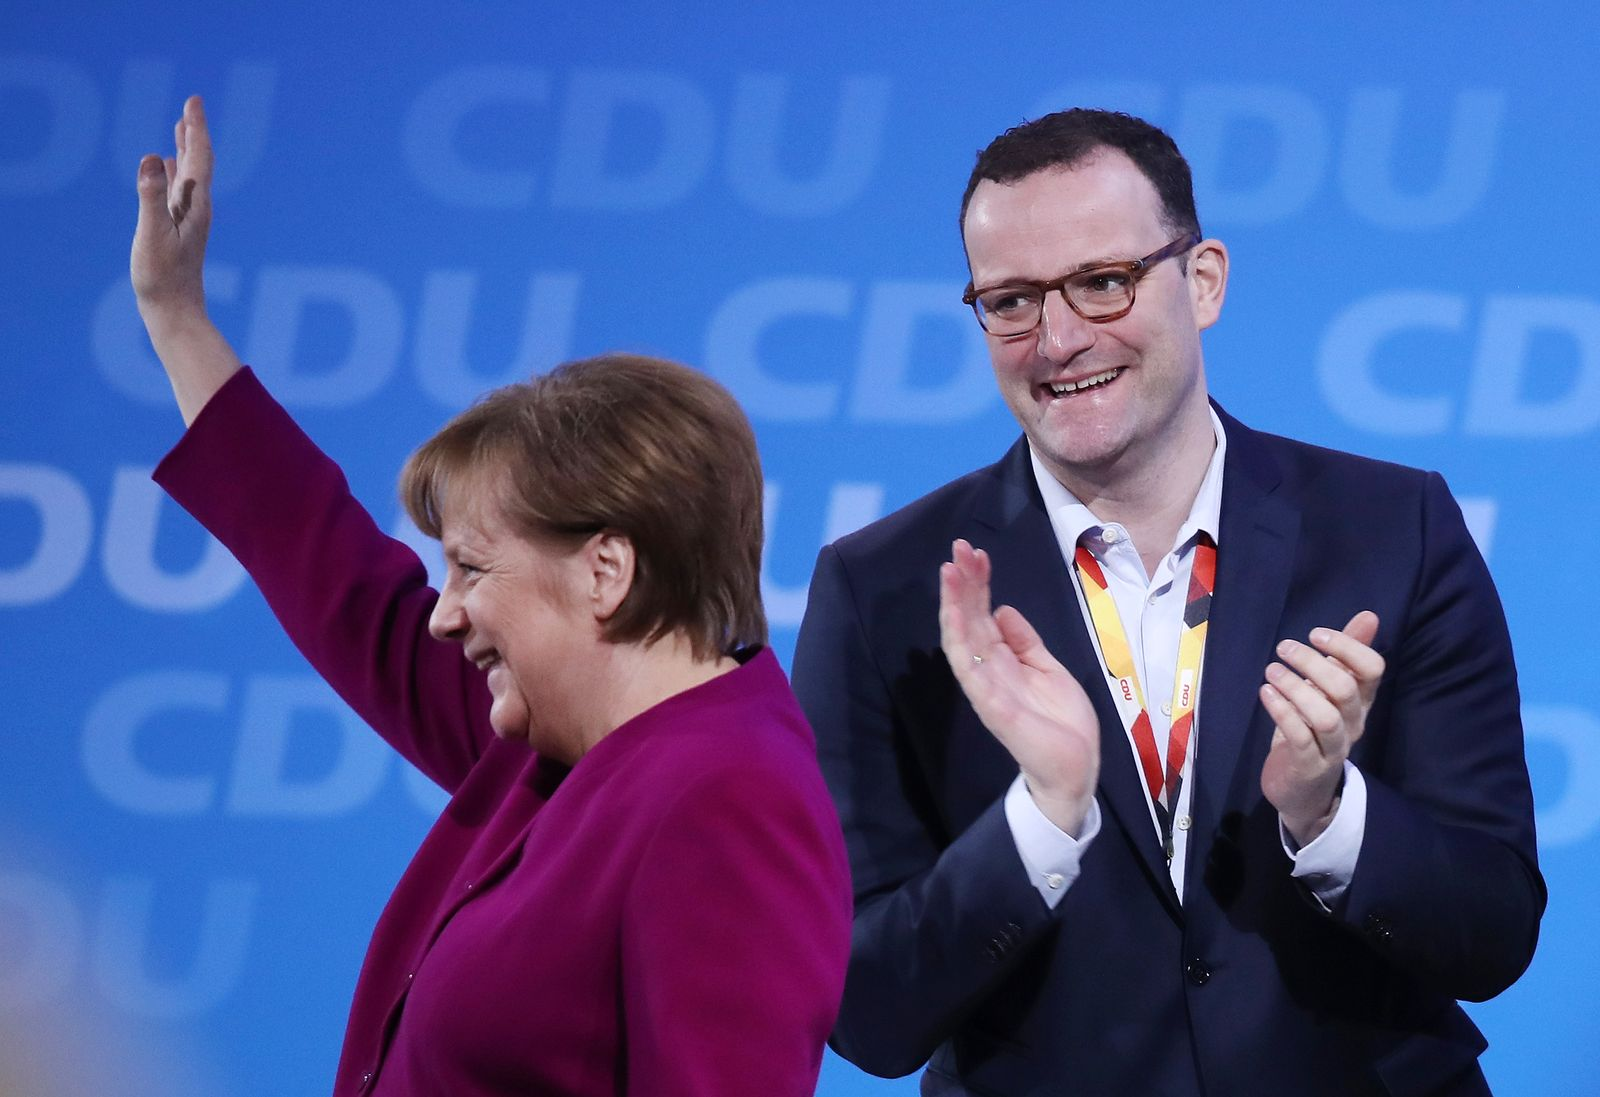 CDU/ Parteitag/ Merkel / Spahn